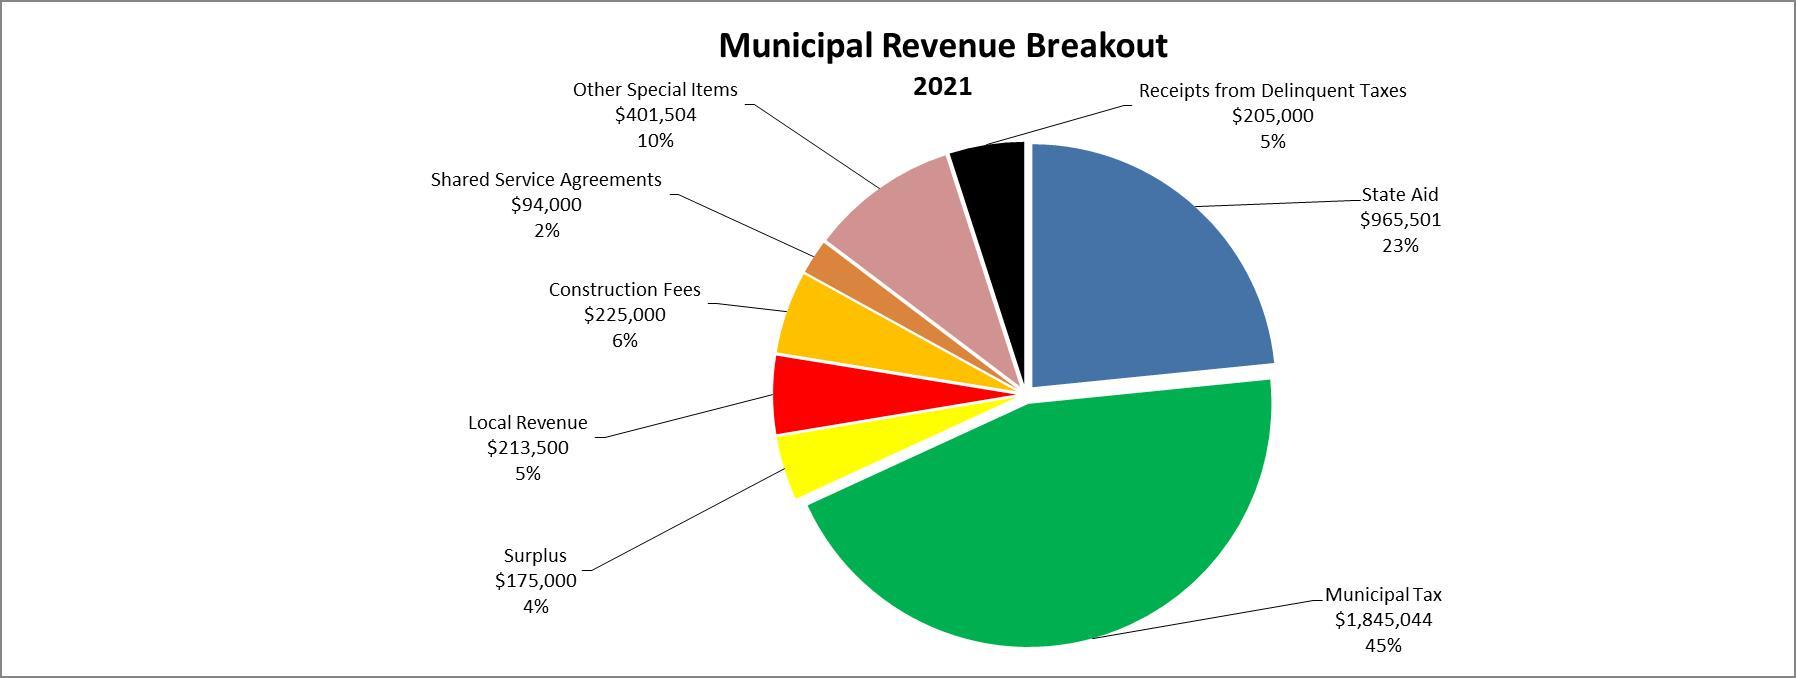 Muni Revenue Breakout Pie Chart